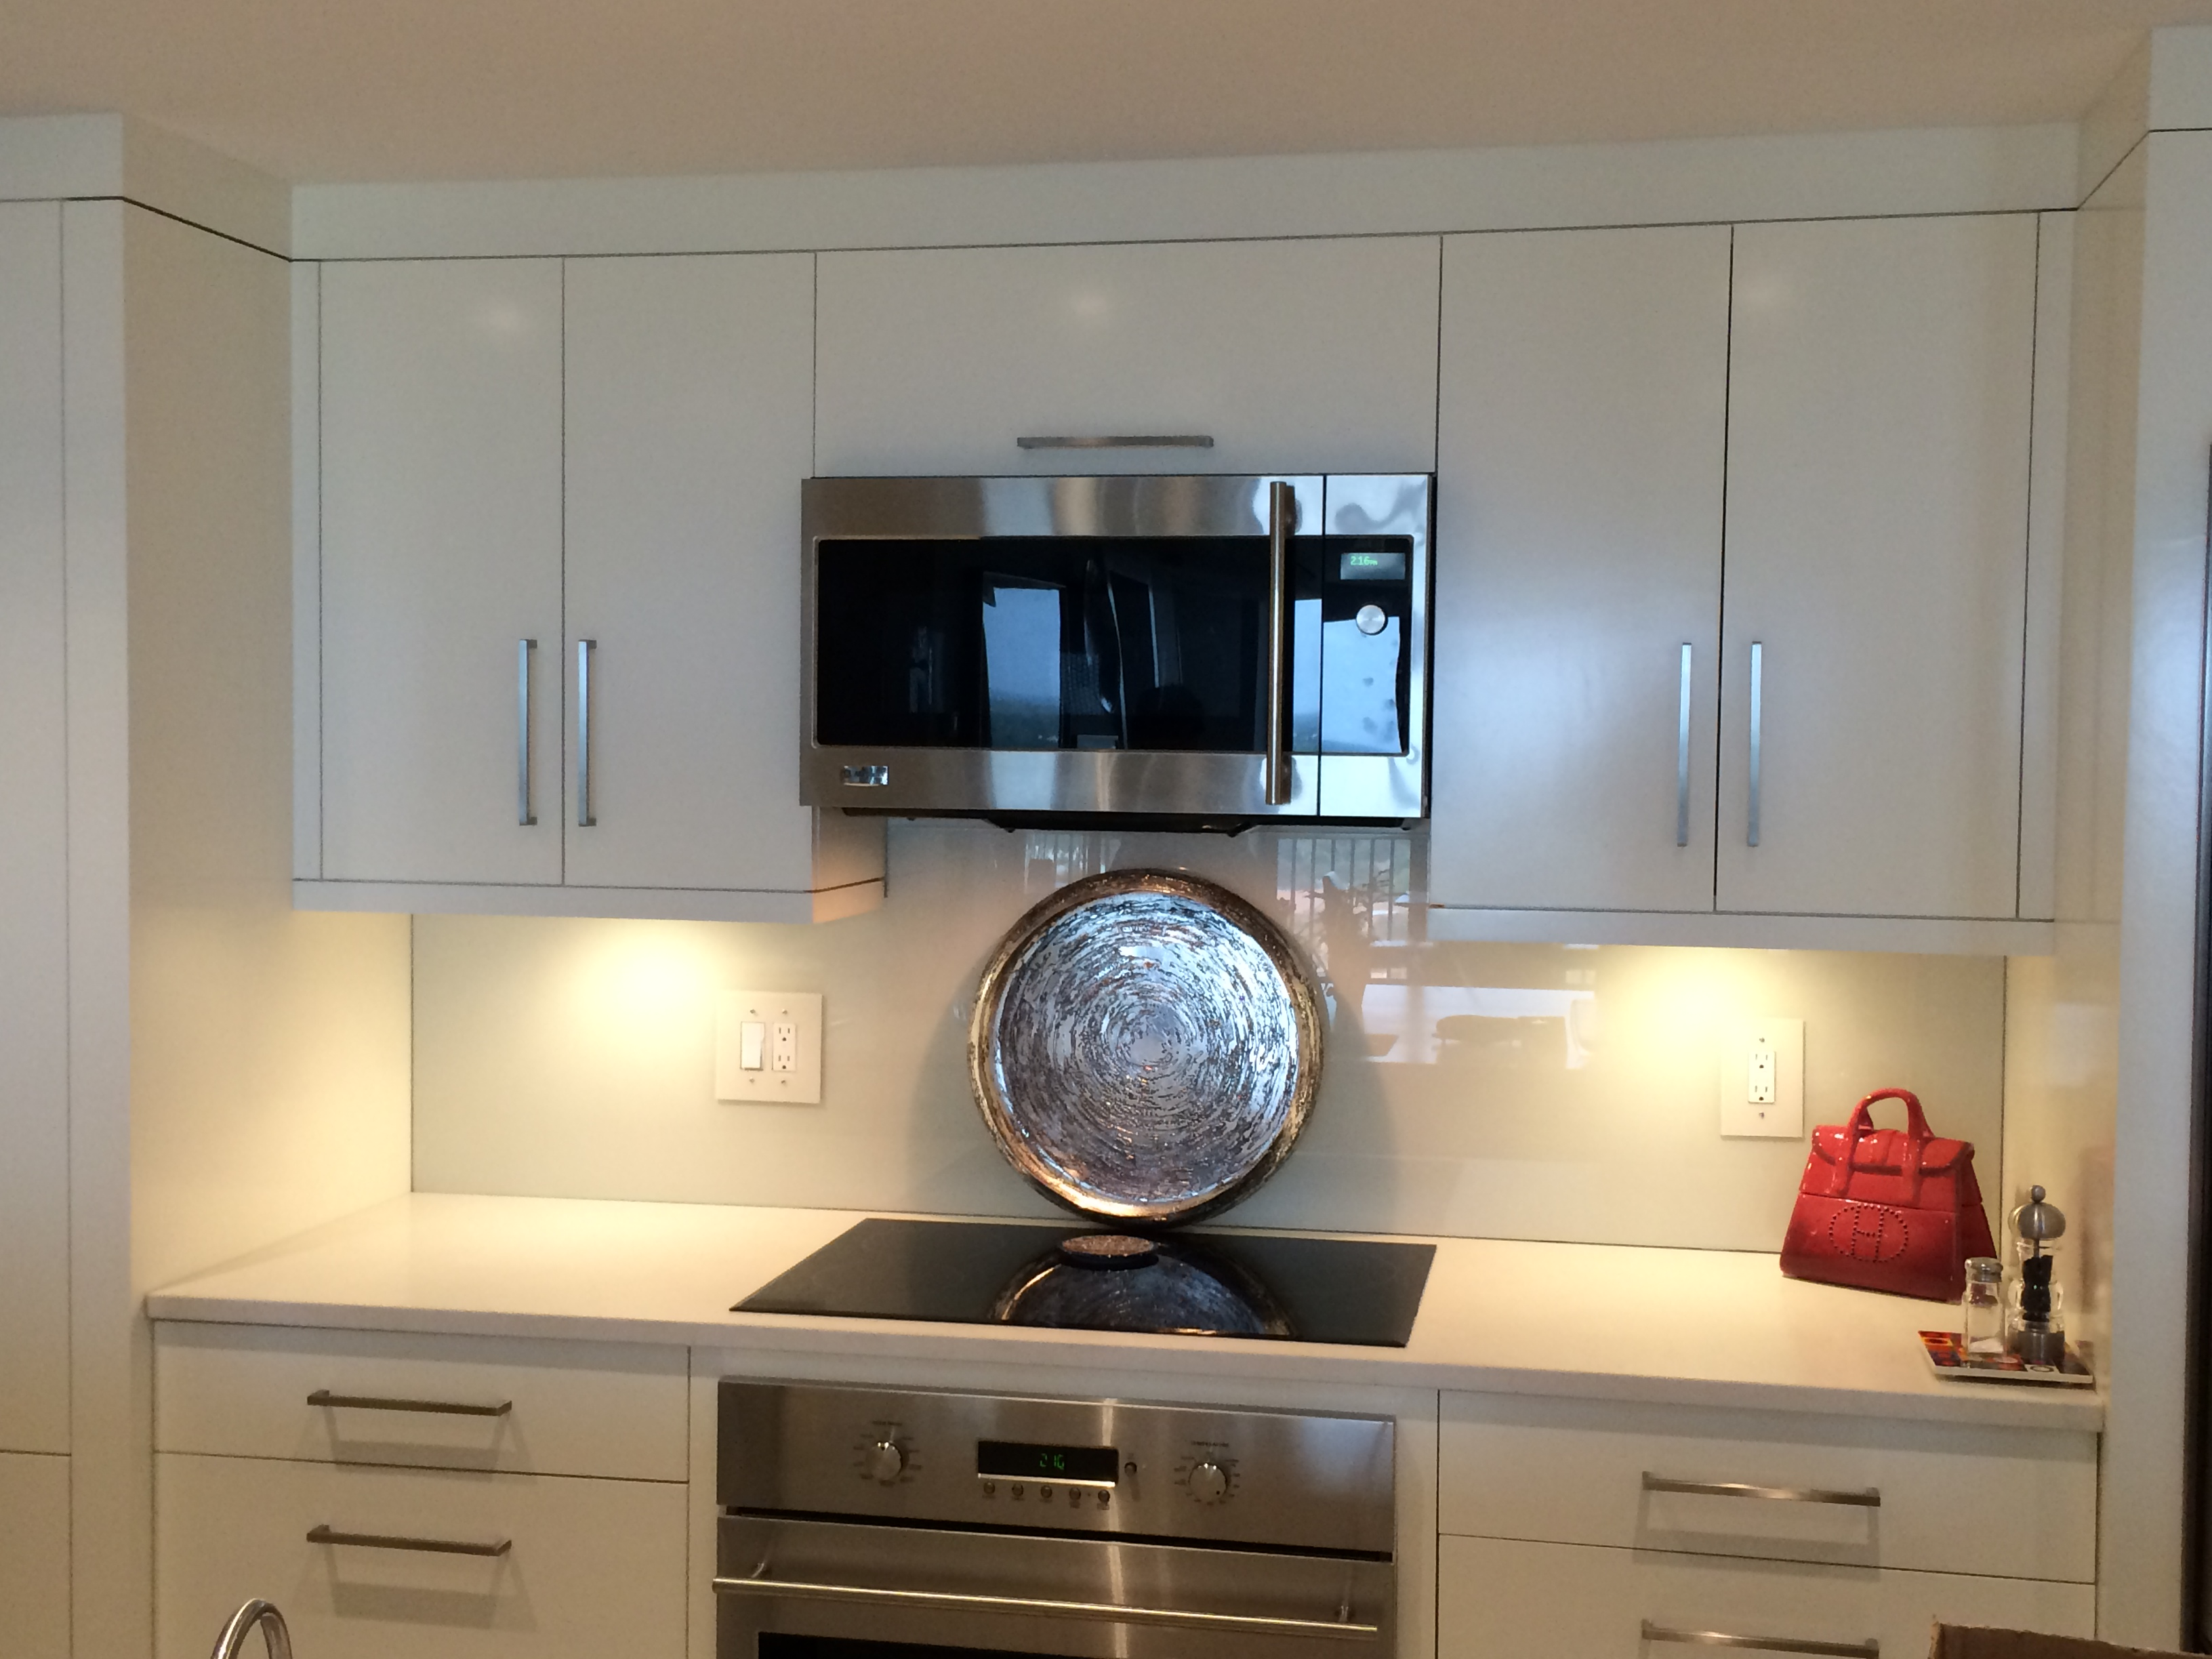 mirror glass backsplash glass backsplashes for kitchens Back painted Glass Backsplash